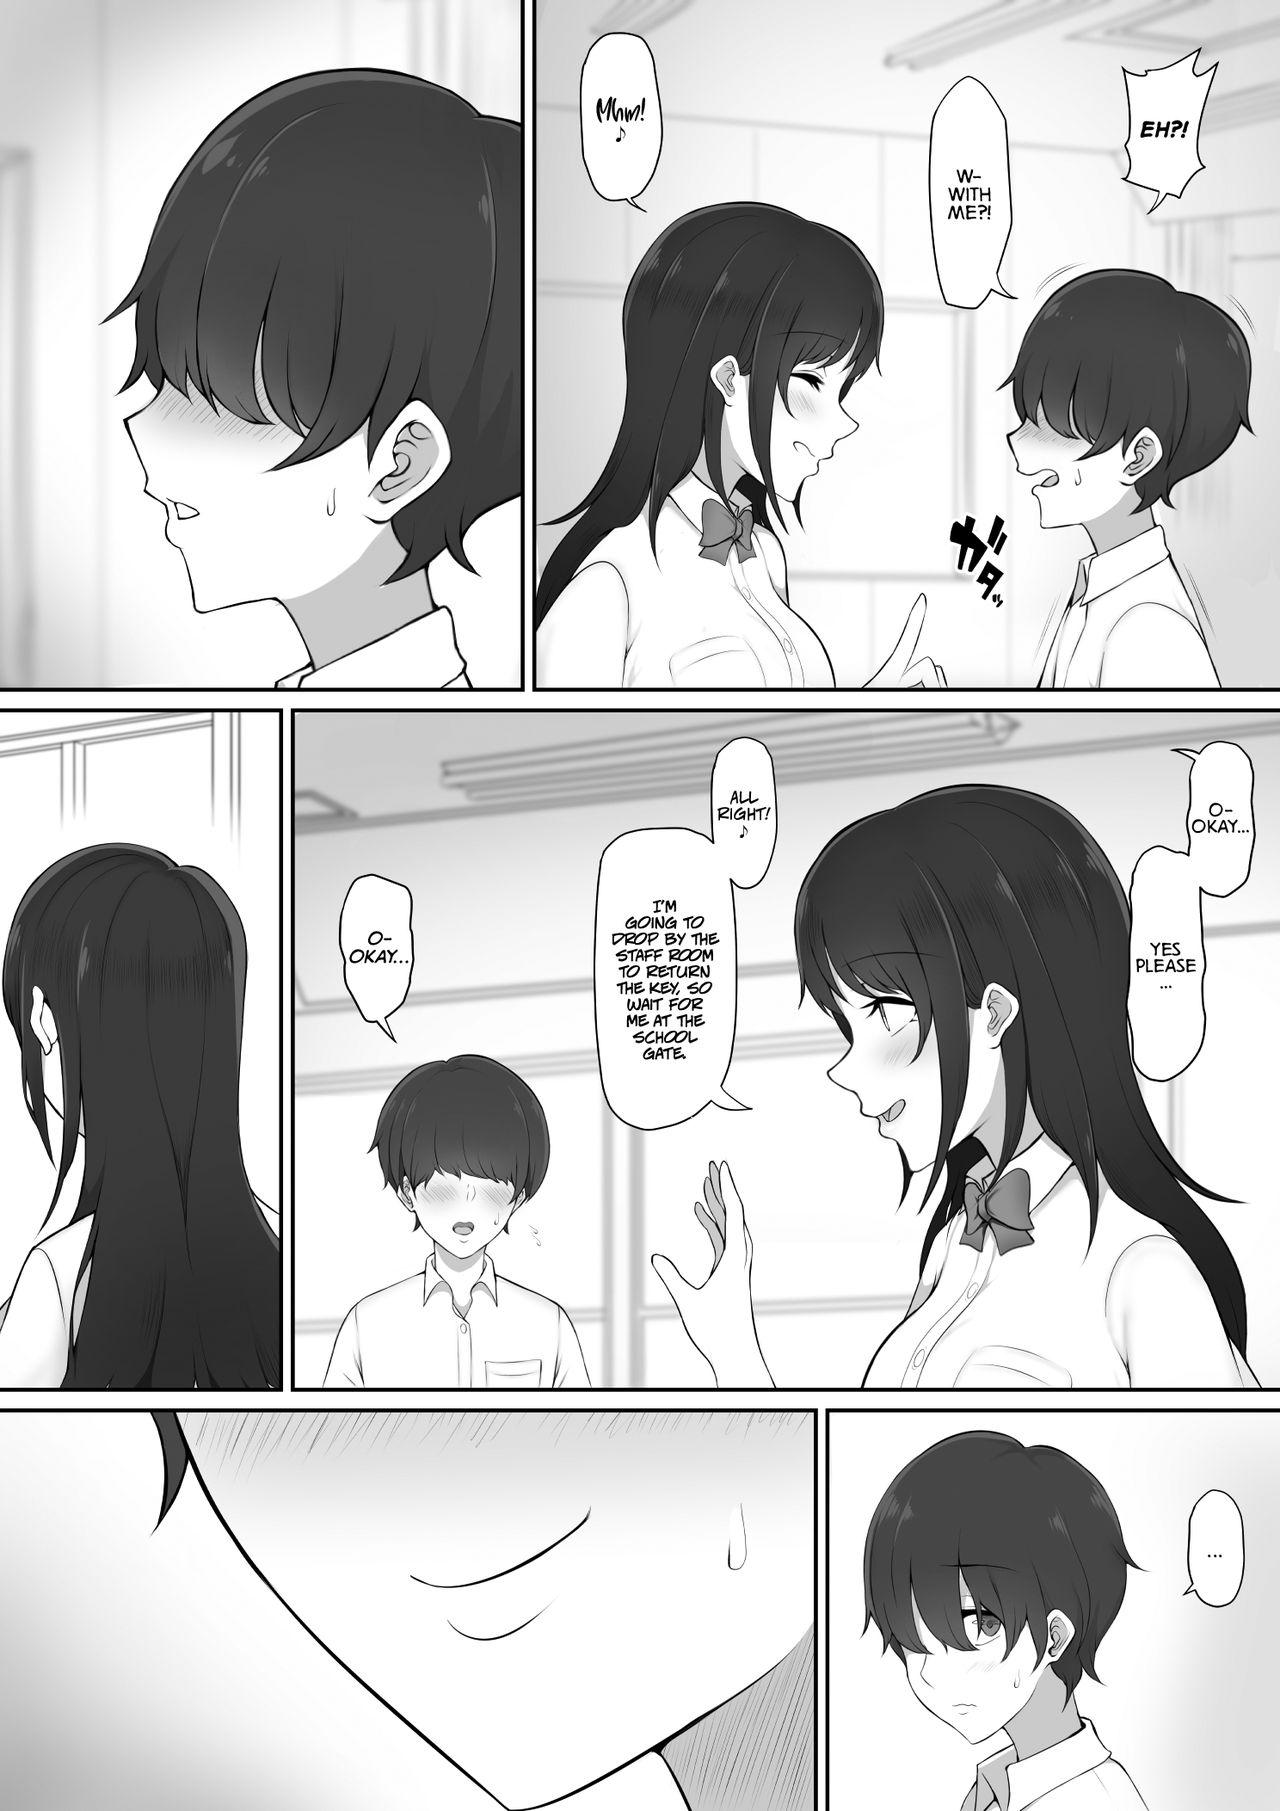 Houkago, Akogare no Senpai ni Tsurerarete- |The Senpai That I Yearn For Brought Me To Her House After School 5